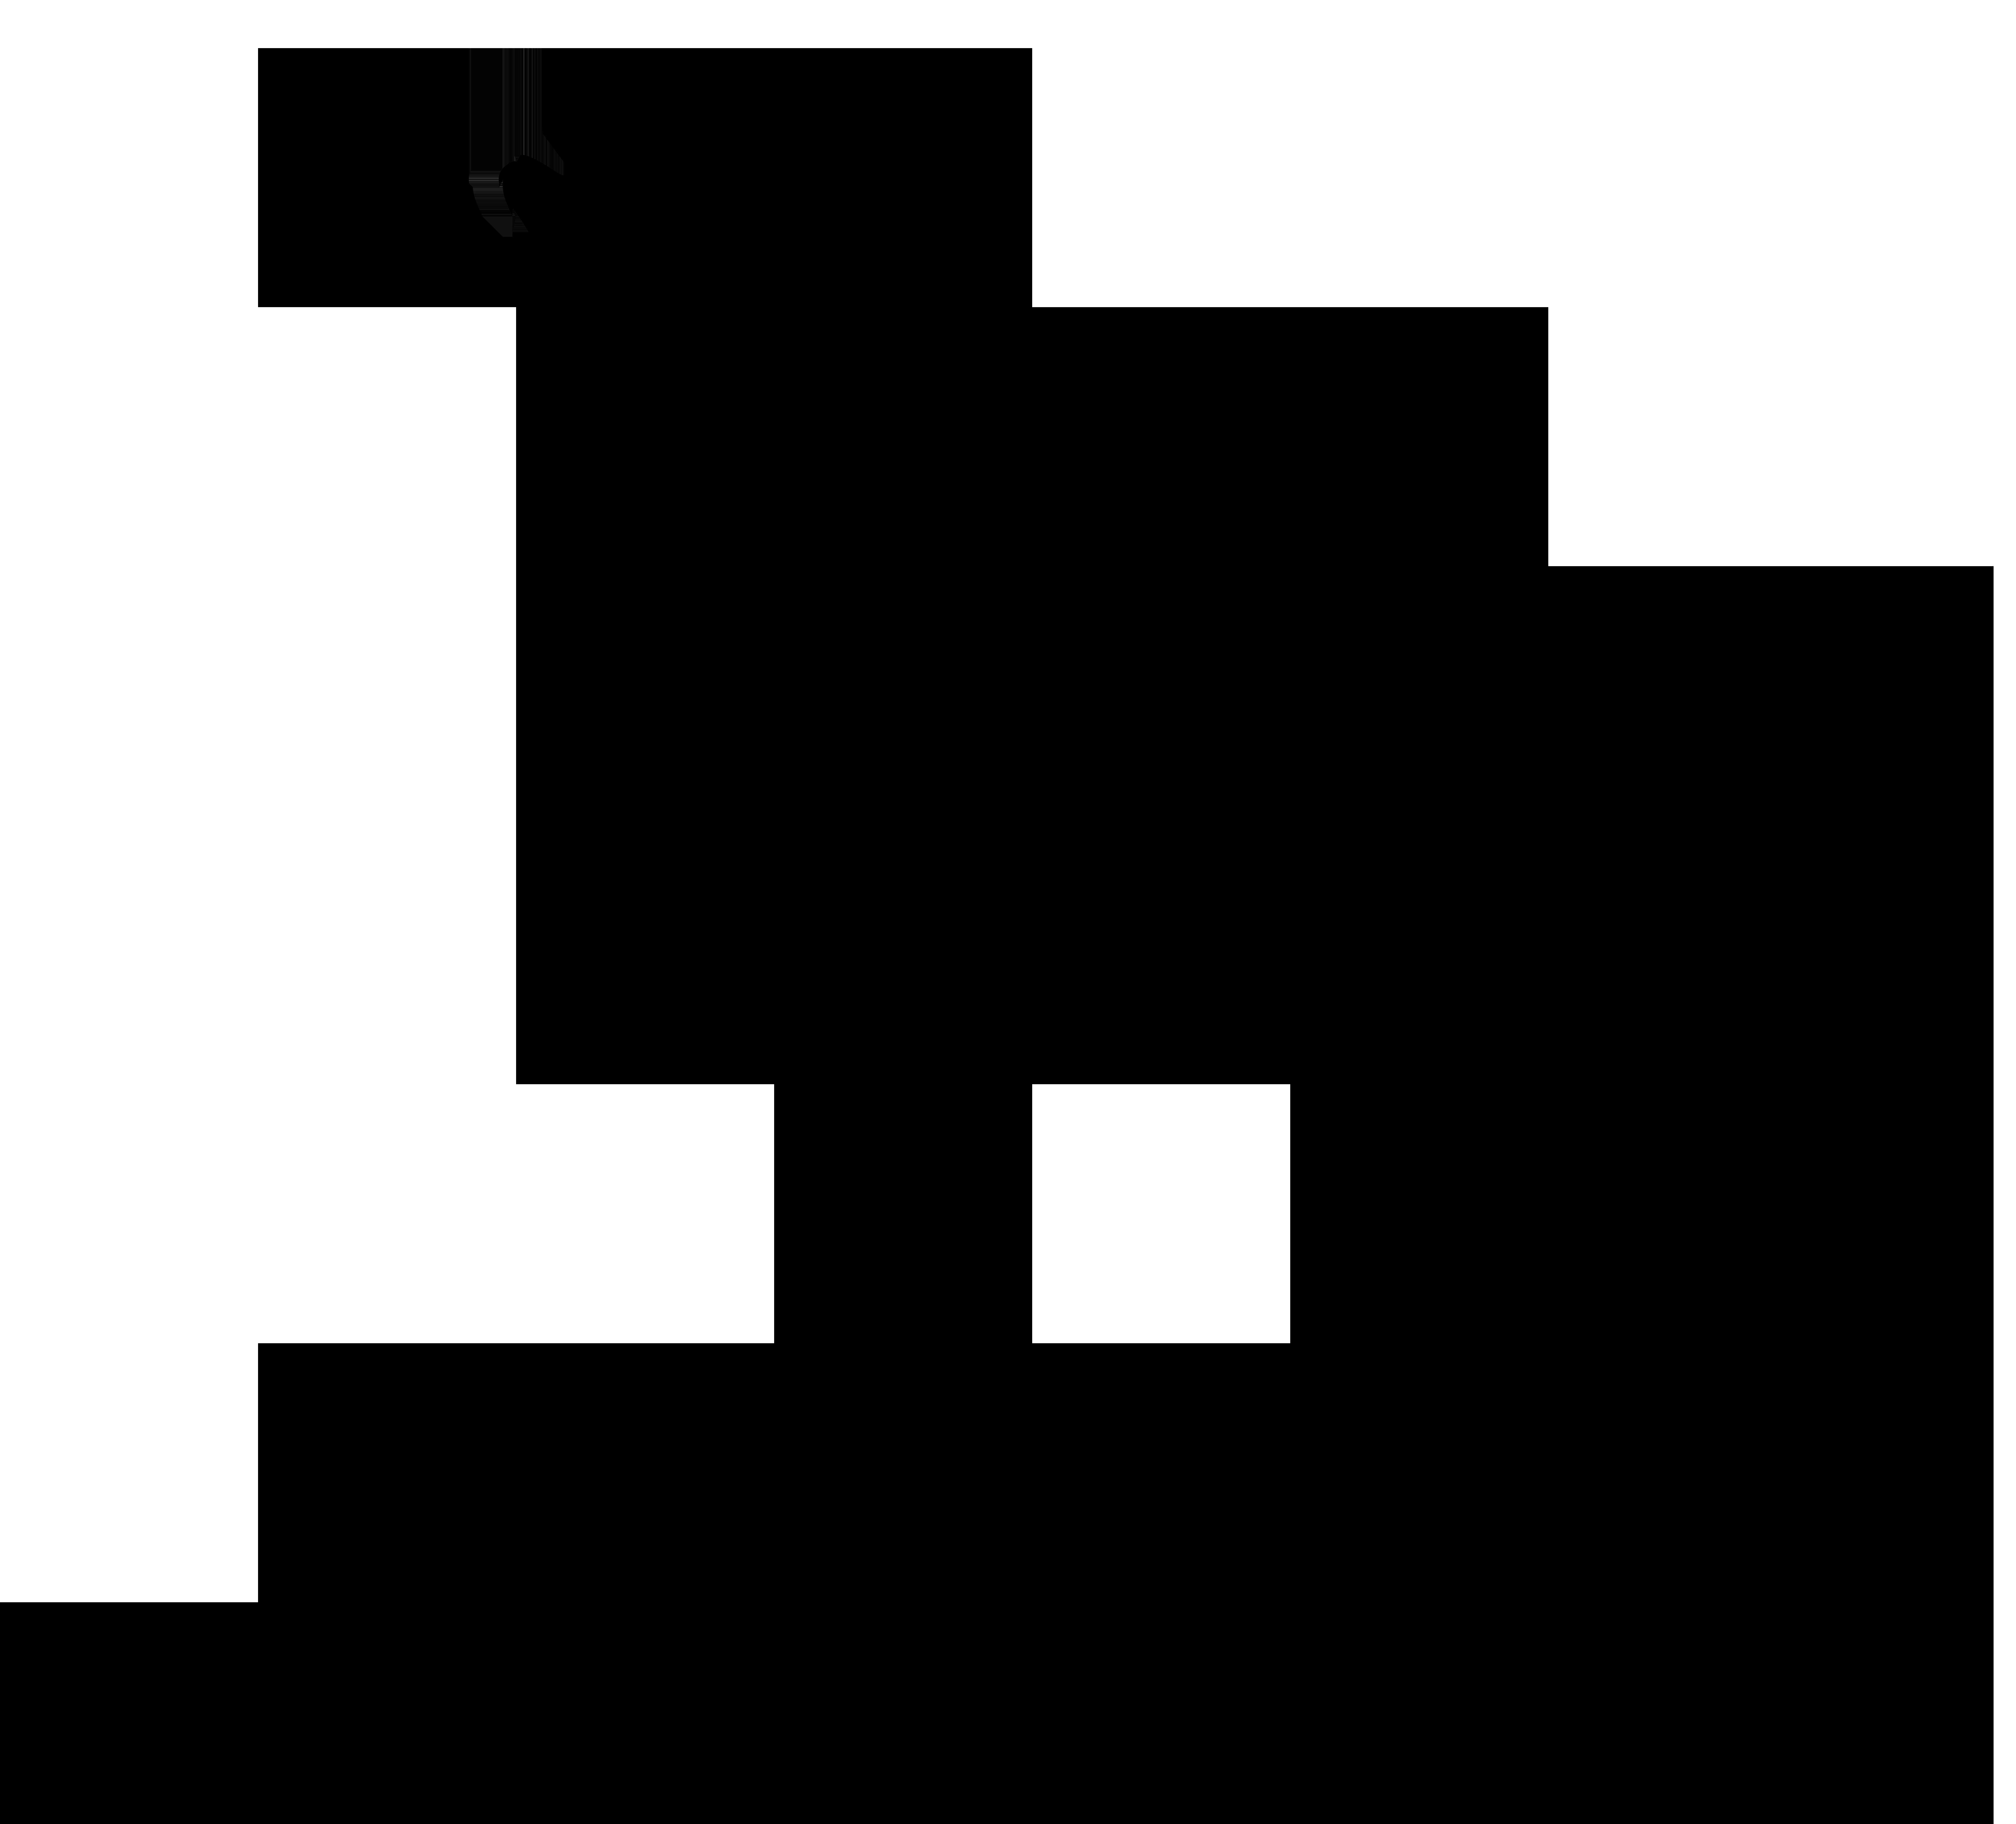 8000x7239 Clip Art Wolf Silhouette Clip Art